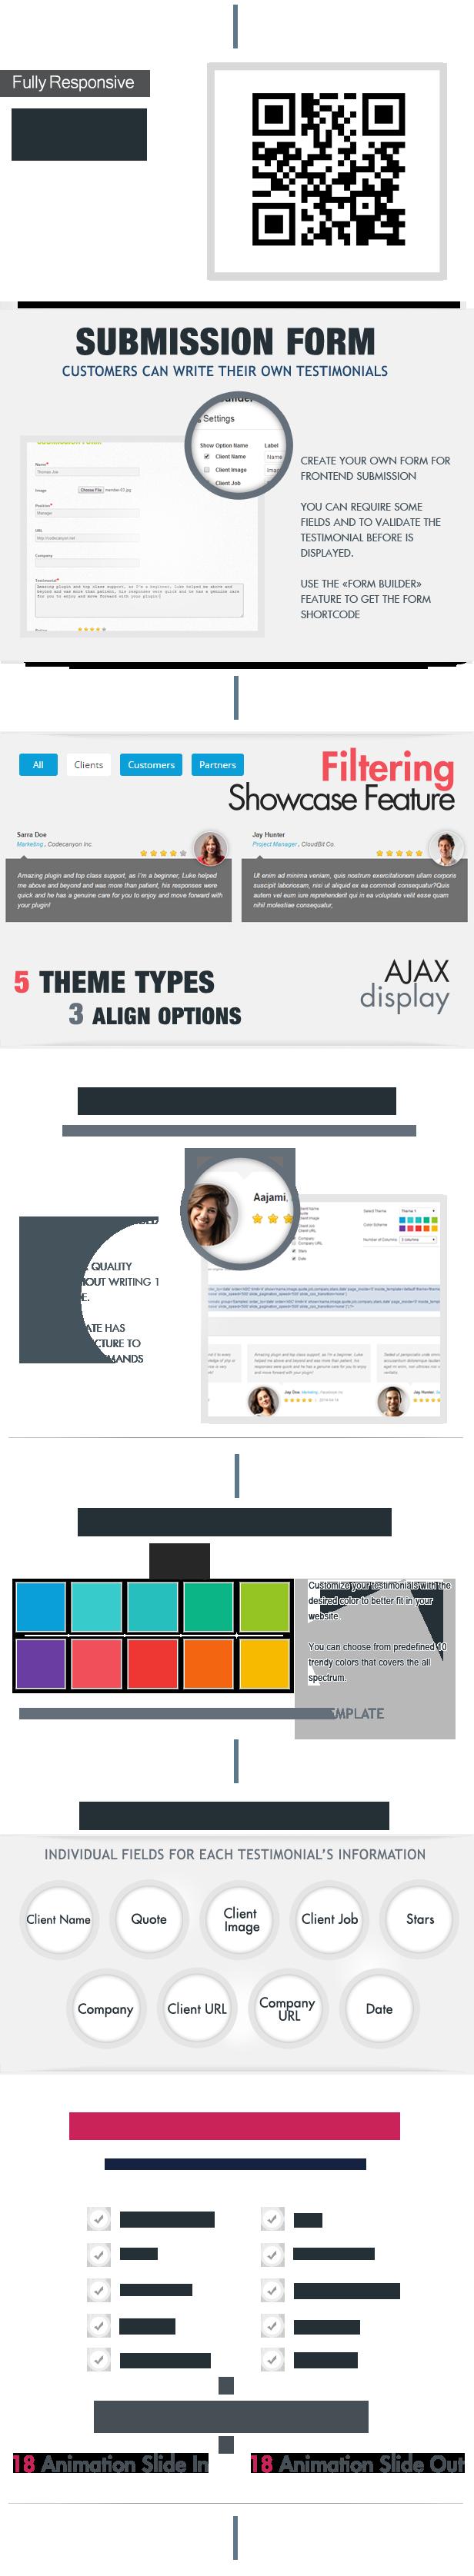 Testimonials Showcase WordPress Plugin - 2